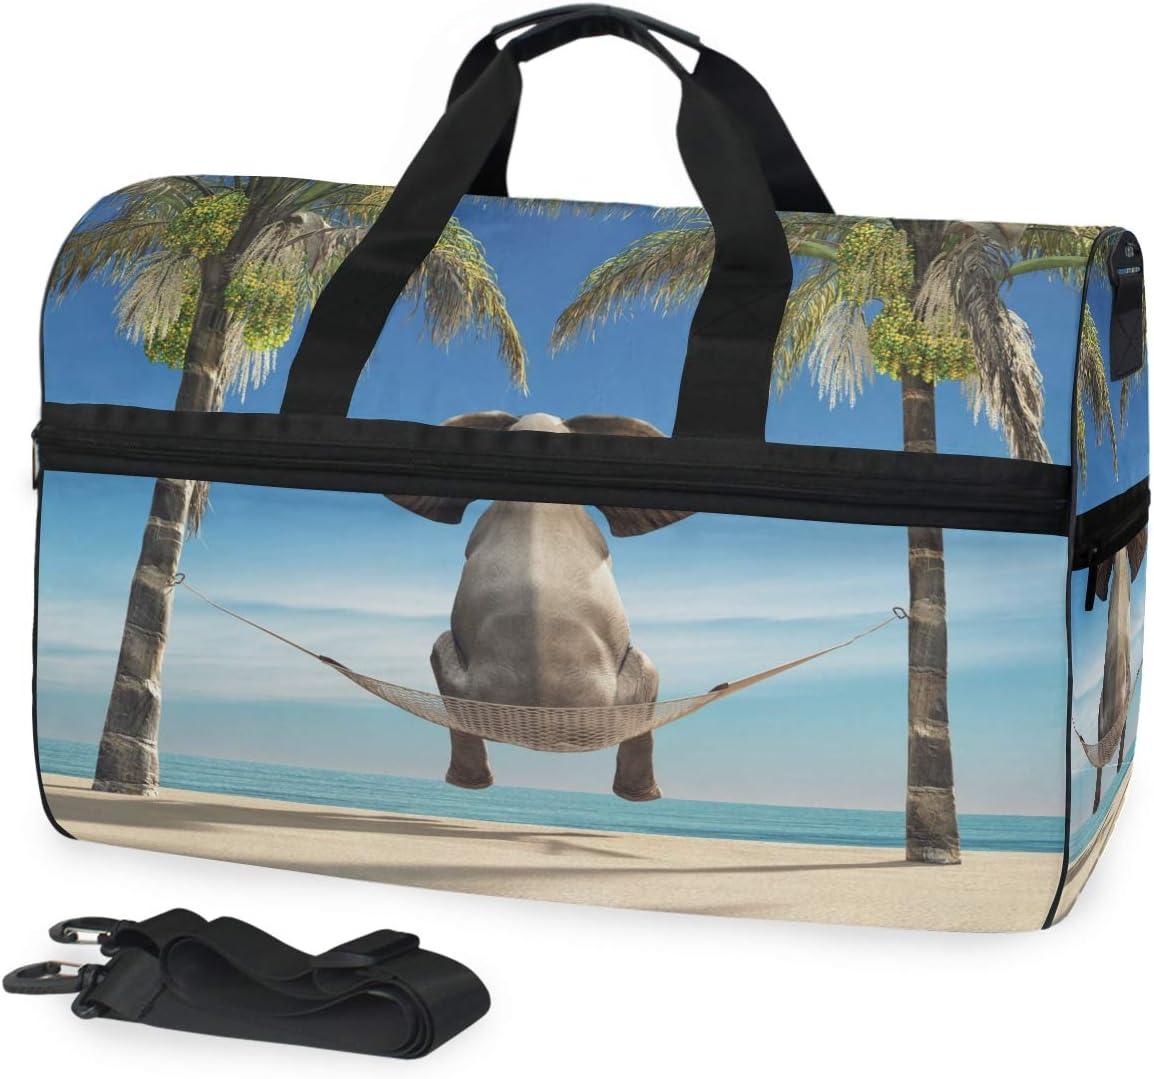 Gym Vacation Travel Duffel Bag Shark Wild Animals Waterproof Lightweight Luggage bag for Sports